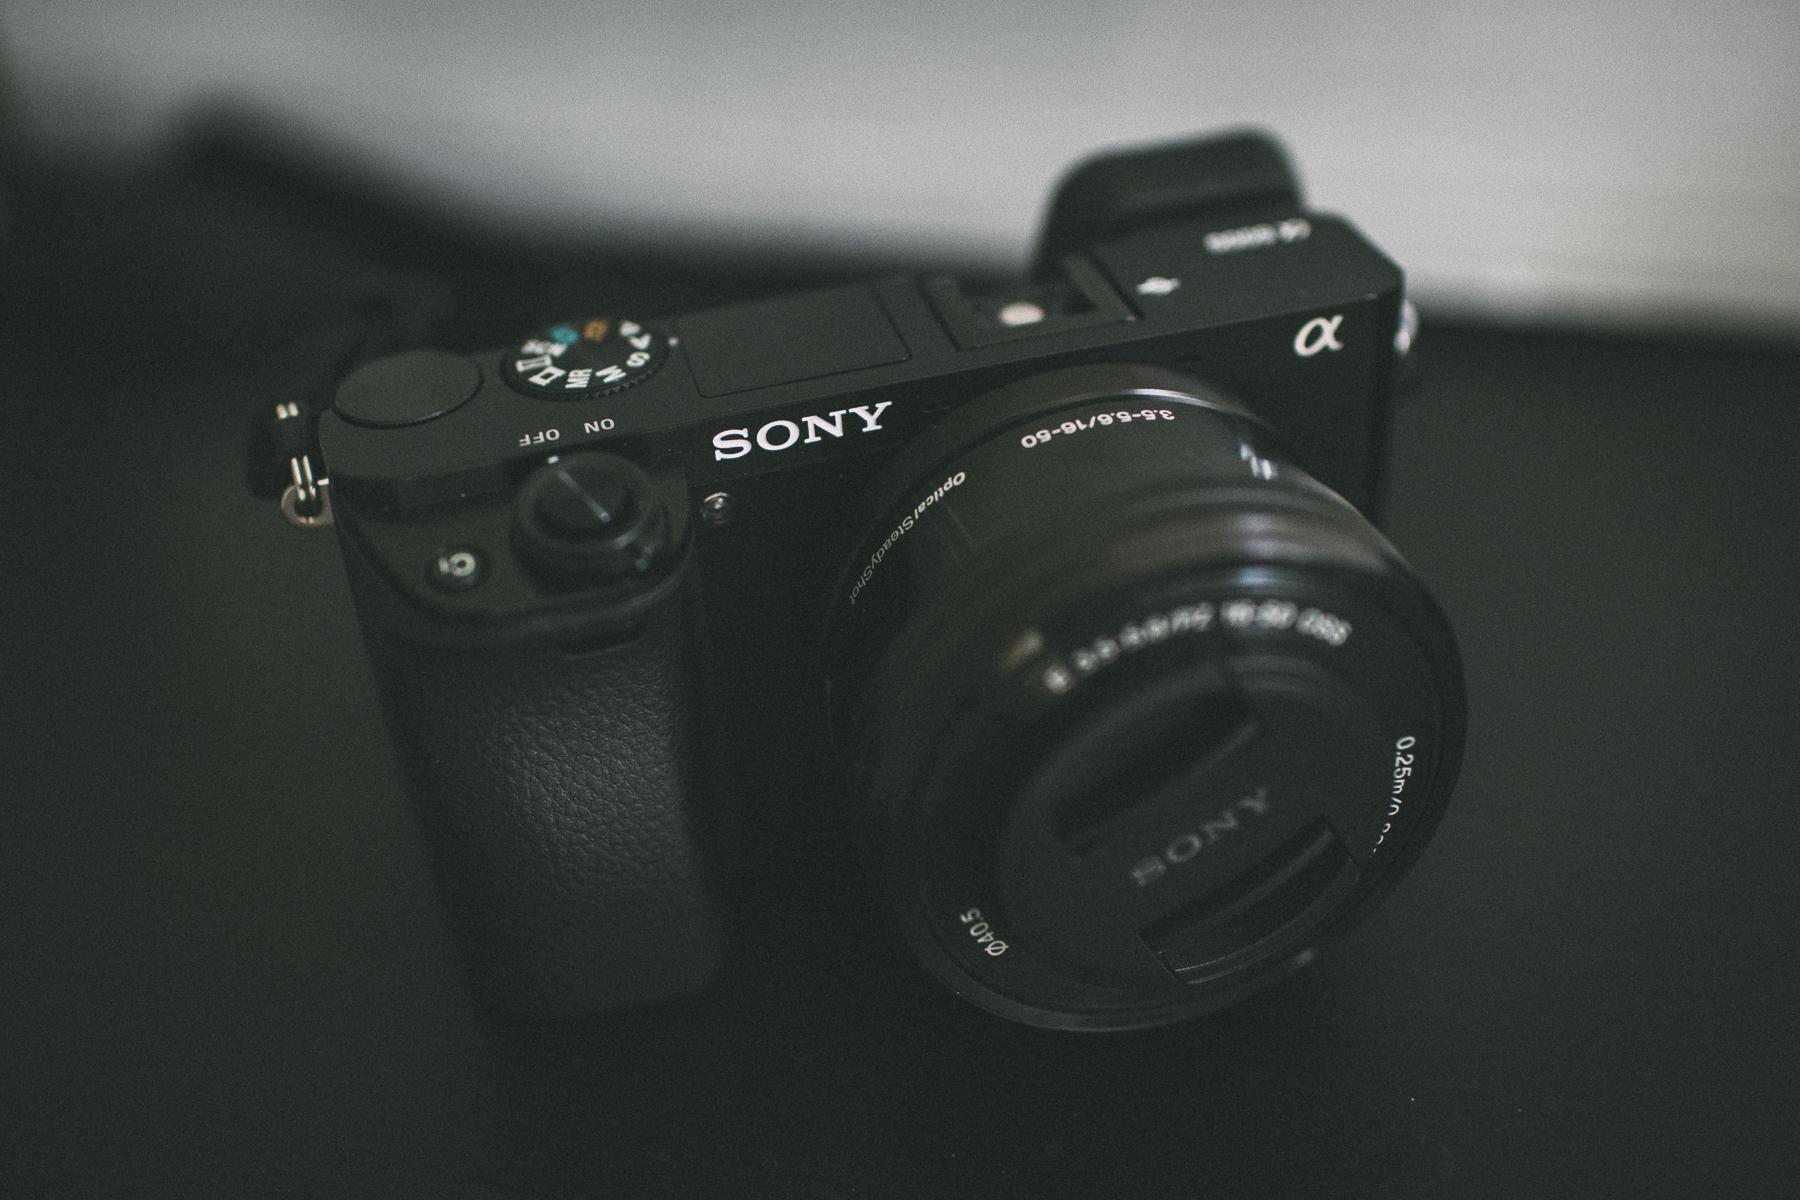 Sony A6000 mirrorless camera south america gear list